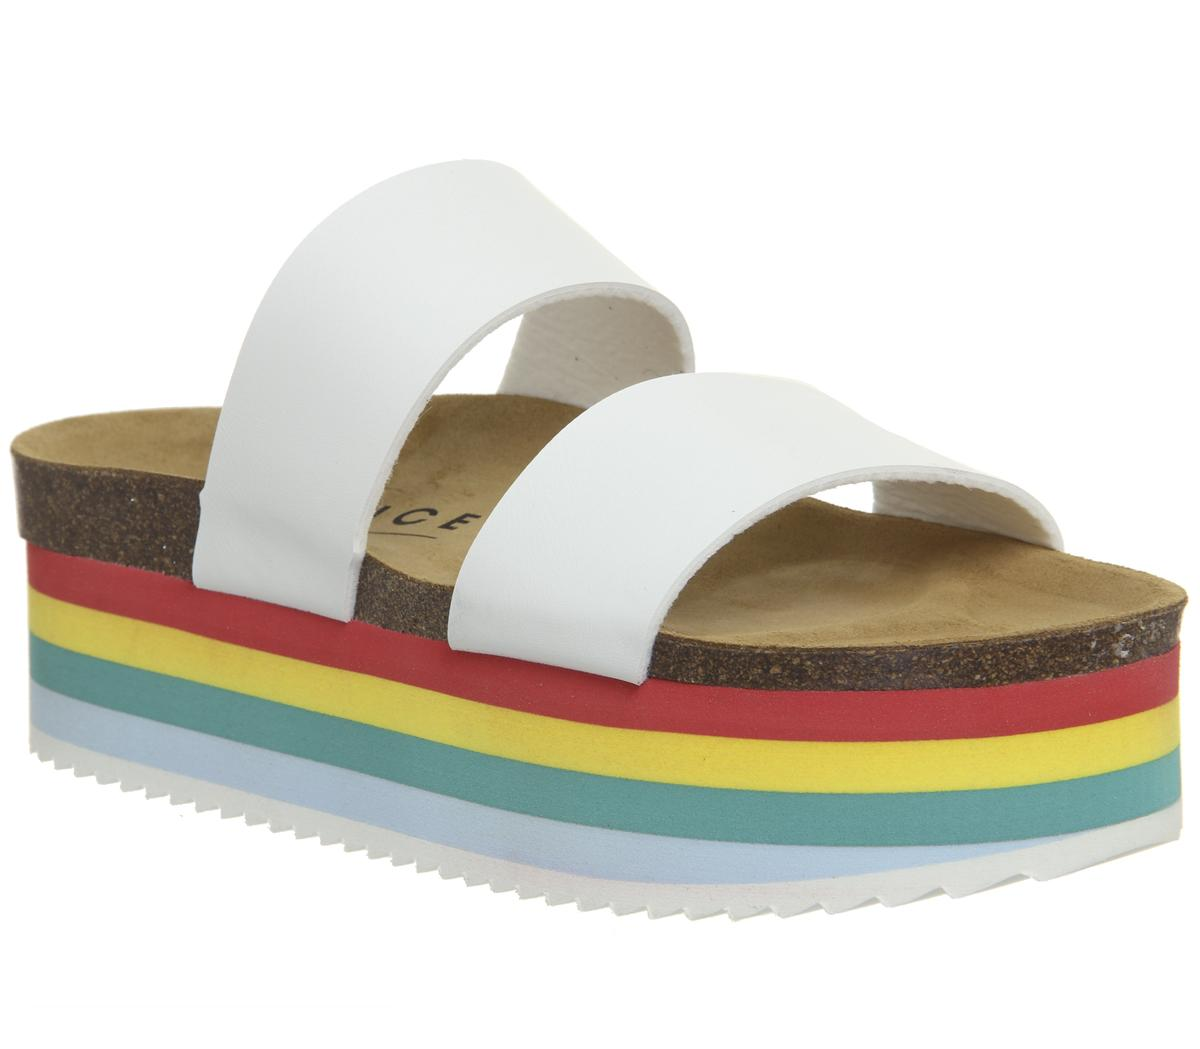 Mambo Striped Sole Two Strap Sandals